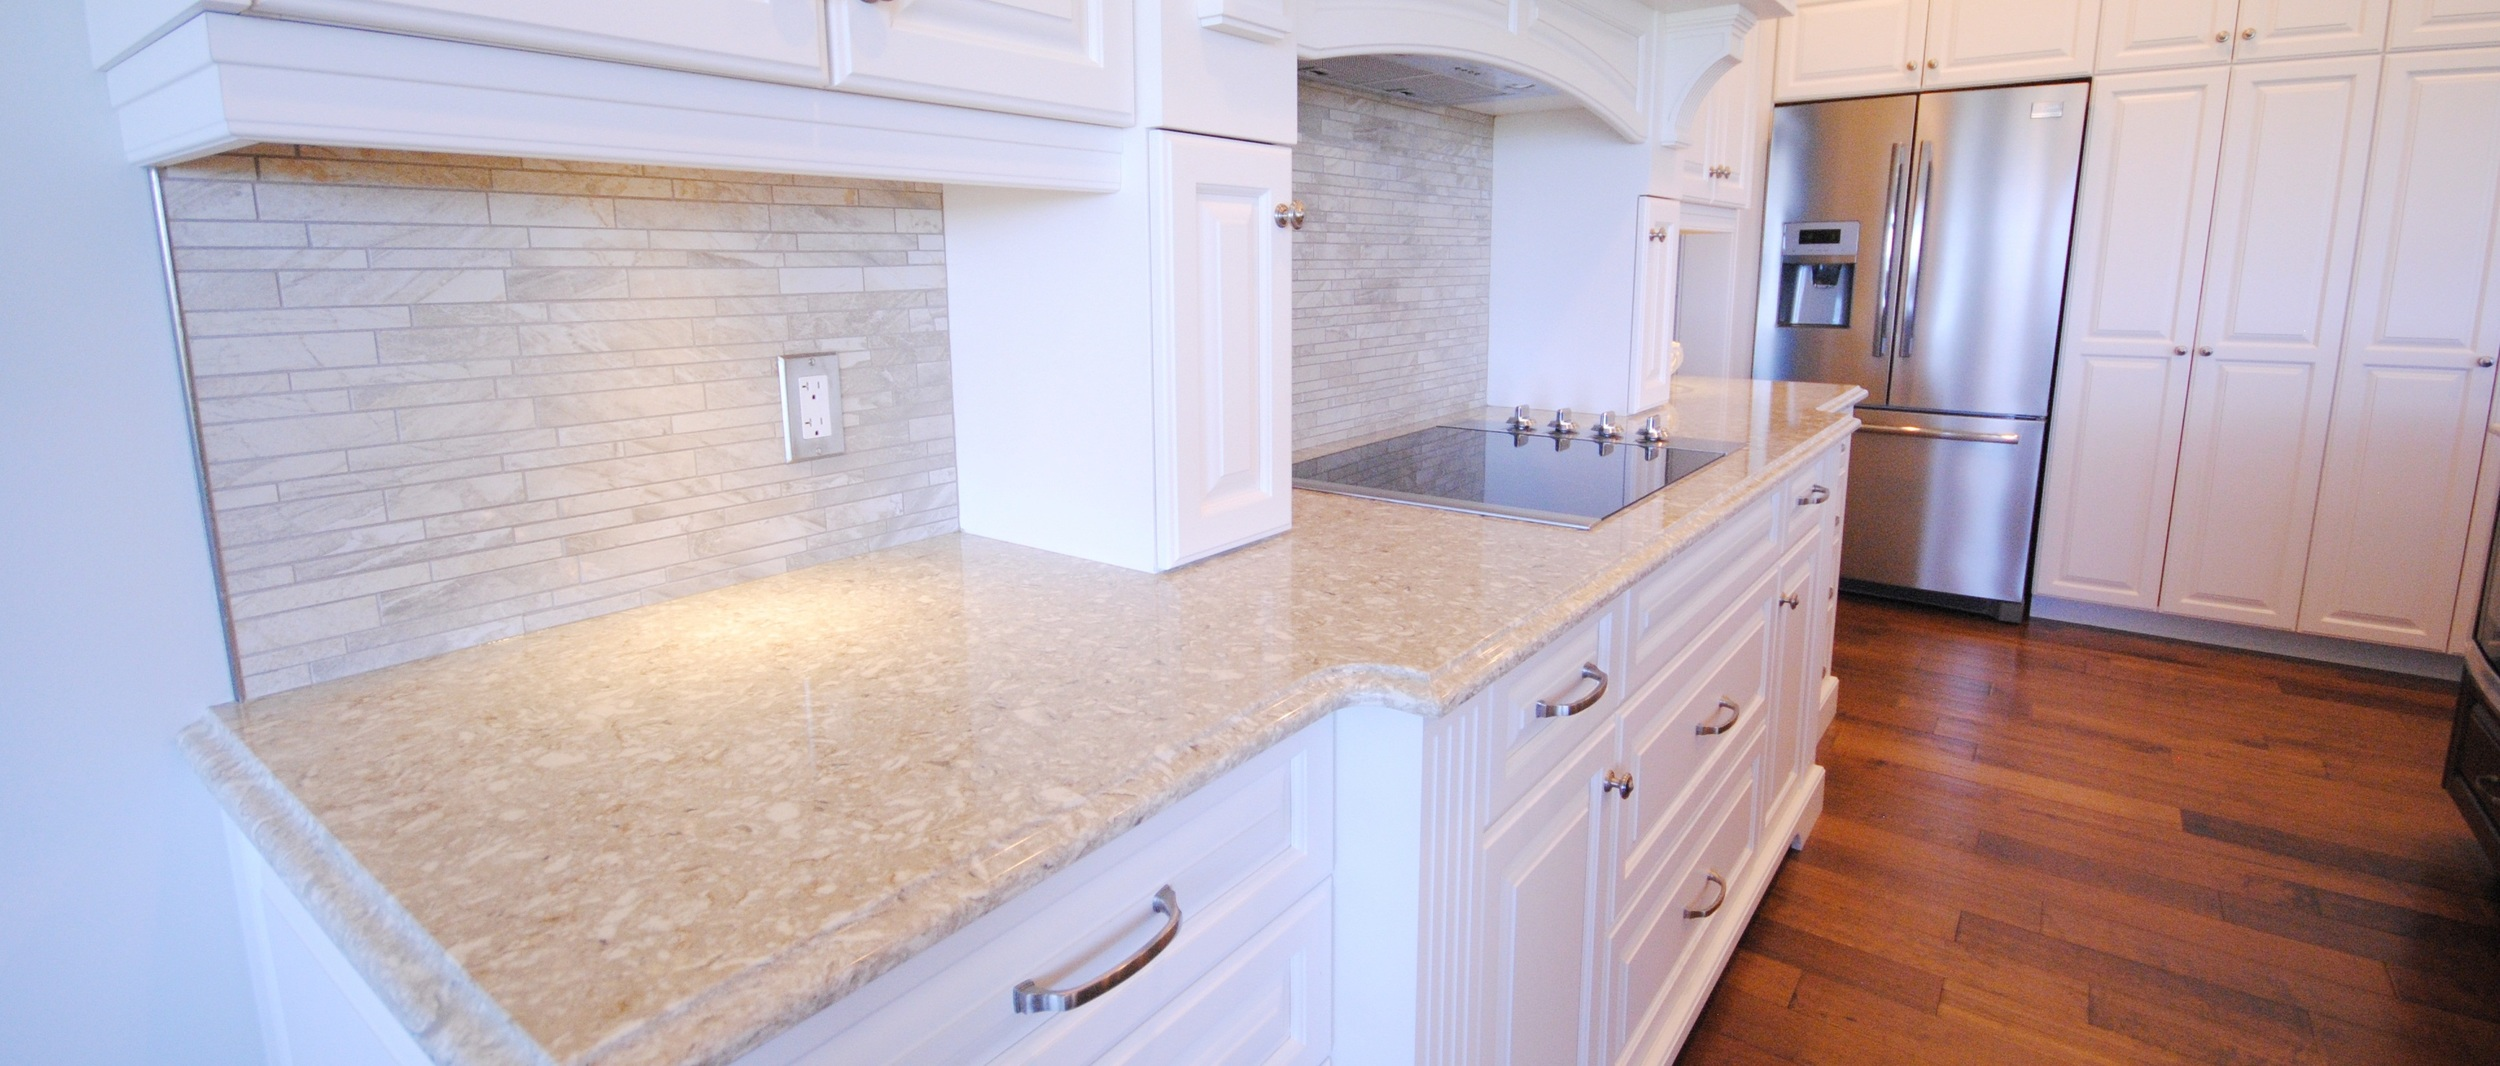 Kitchen back-splash with quartz counter-top